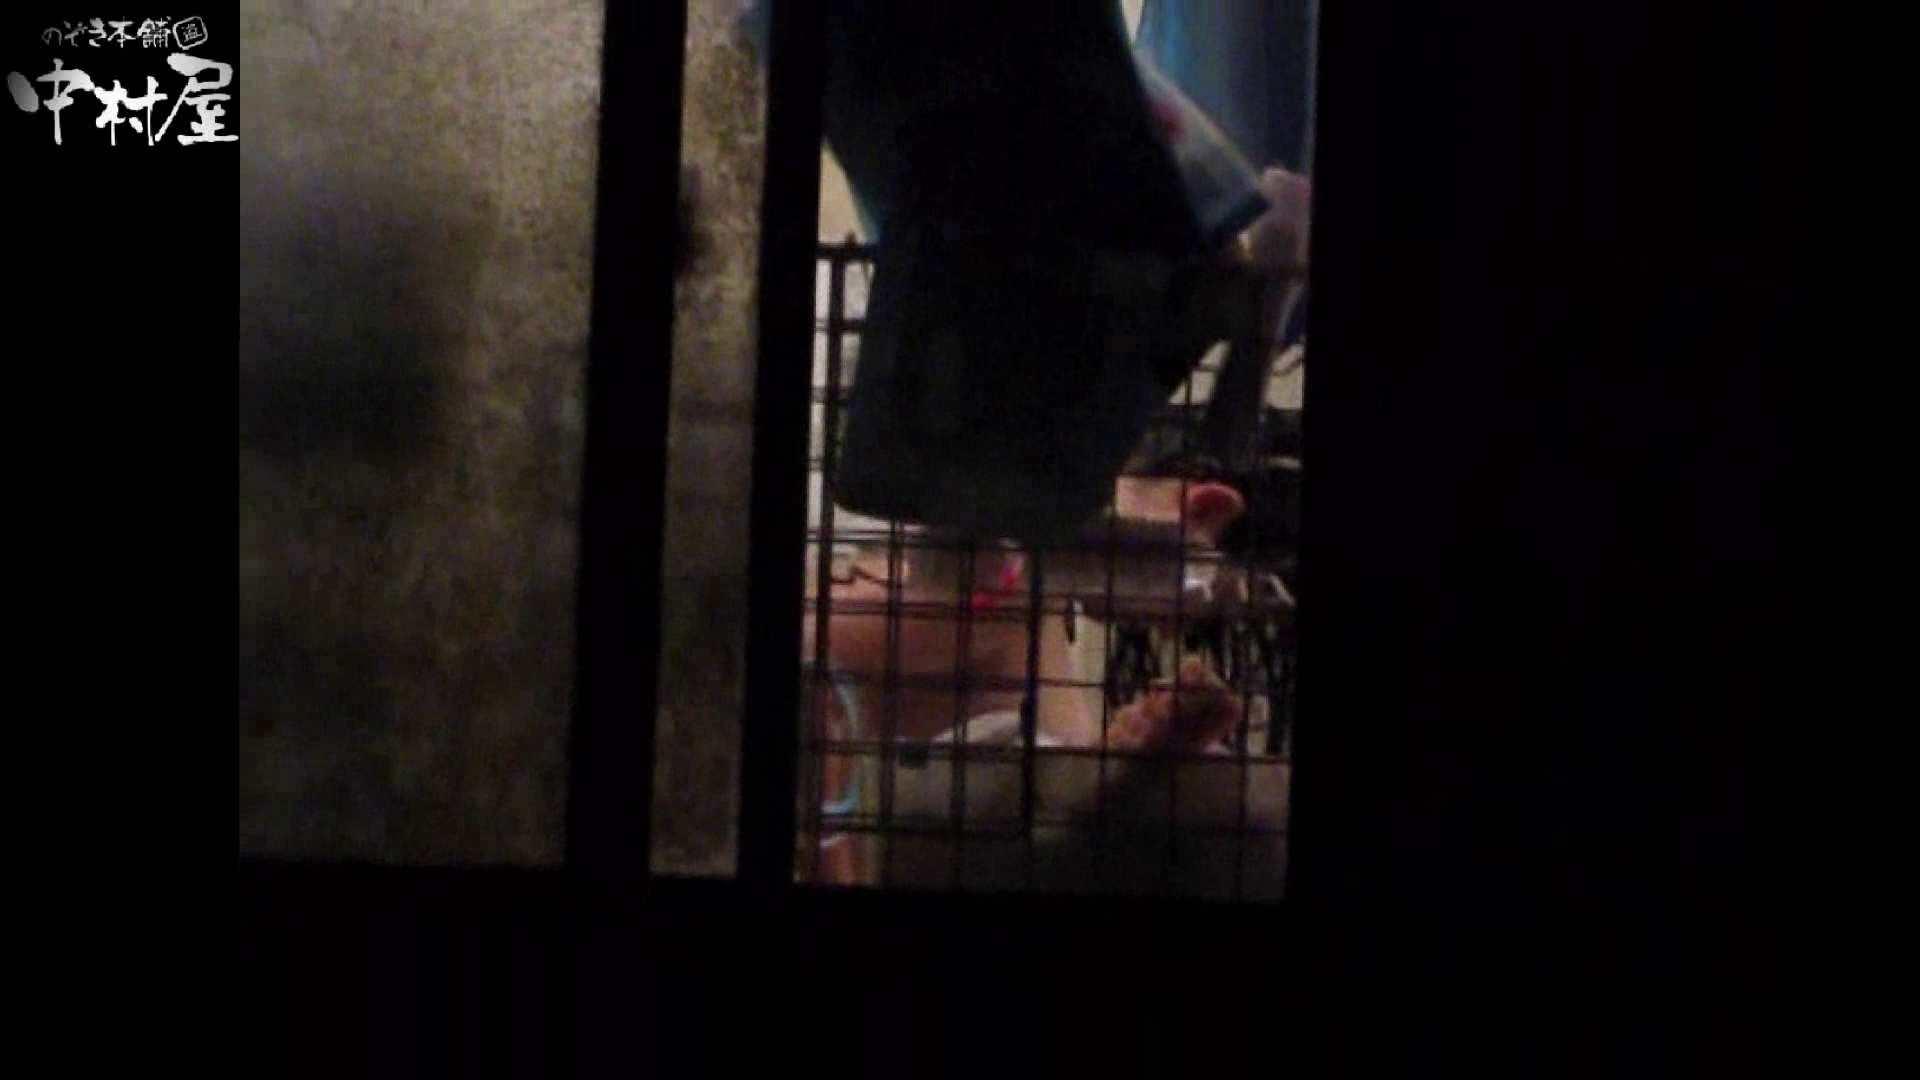 民家風呂専門盗撮師の超危険映像 vol.023 OLのエロ生活 性交動画流出 95連発 38